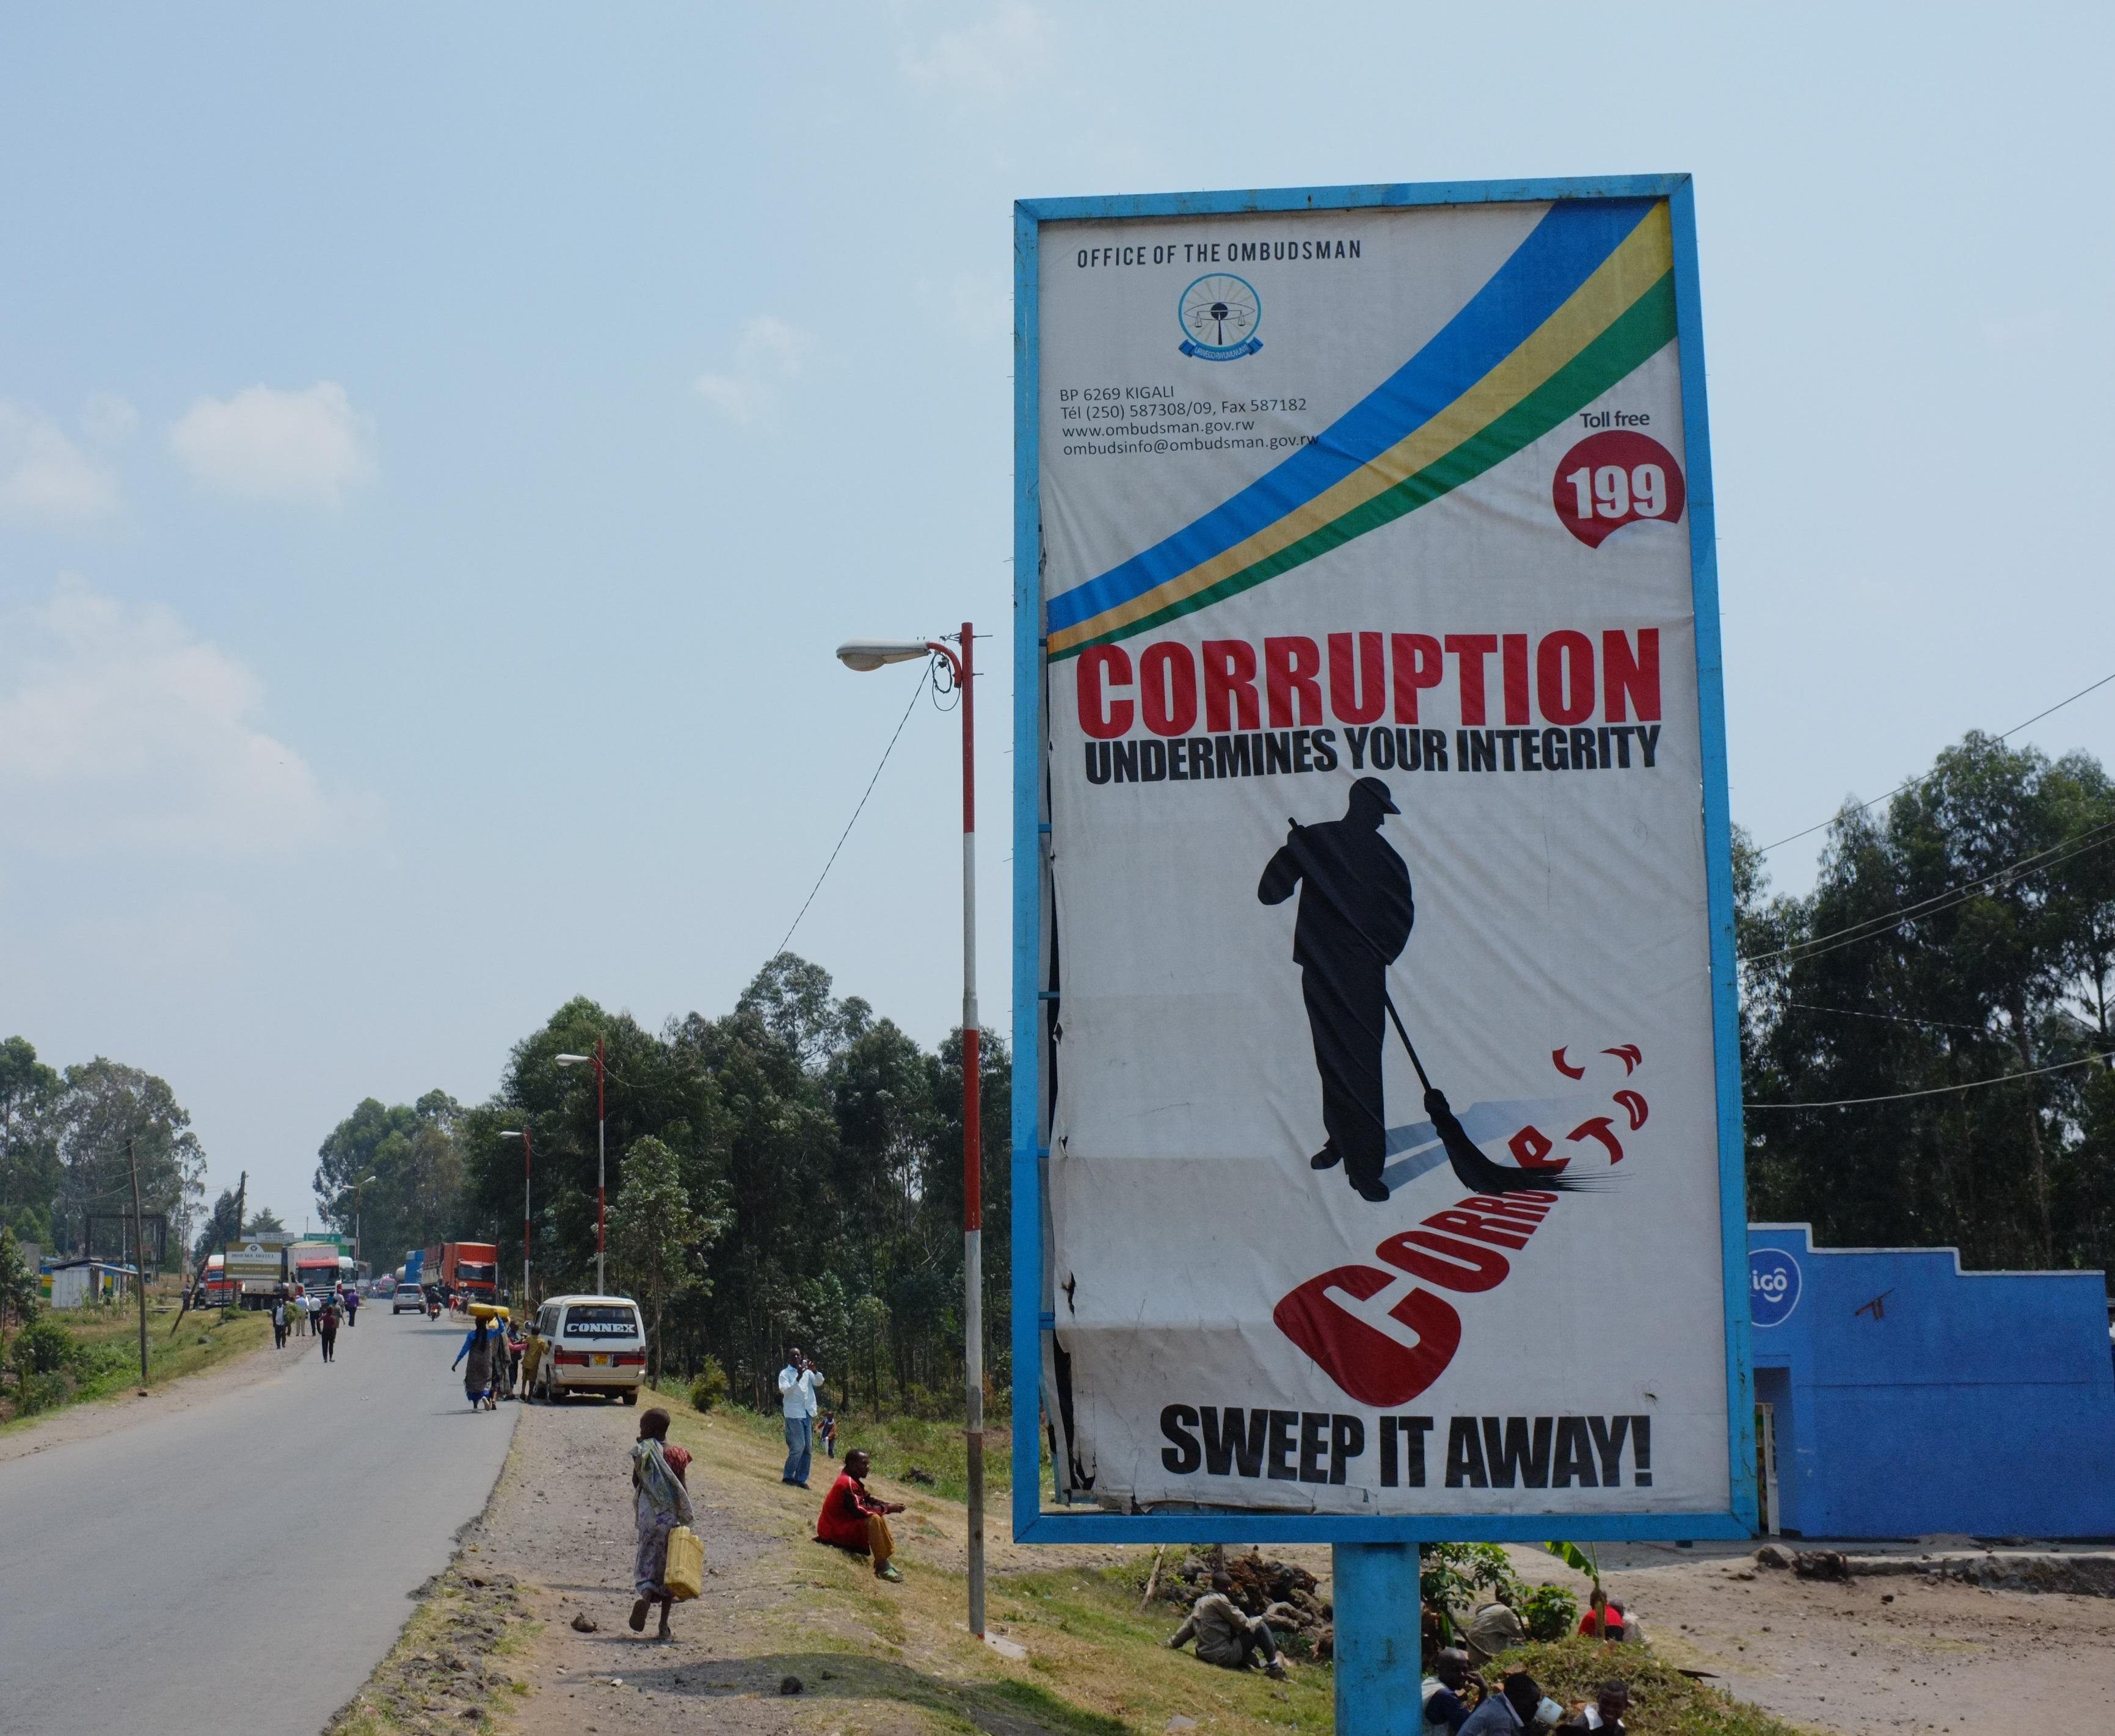 Corruptionunderminesintegrity FredInklaar FlickrA